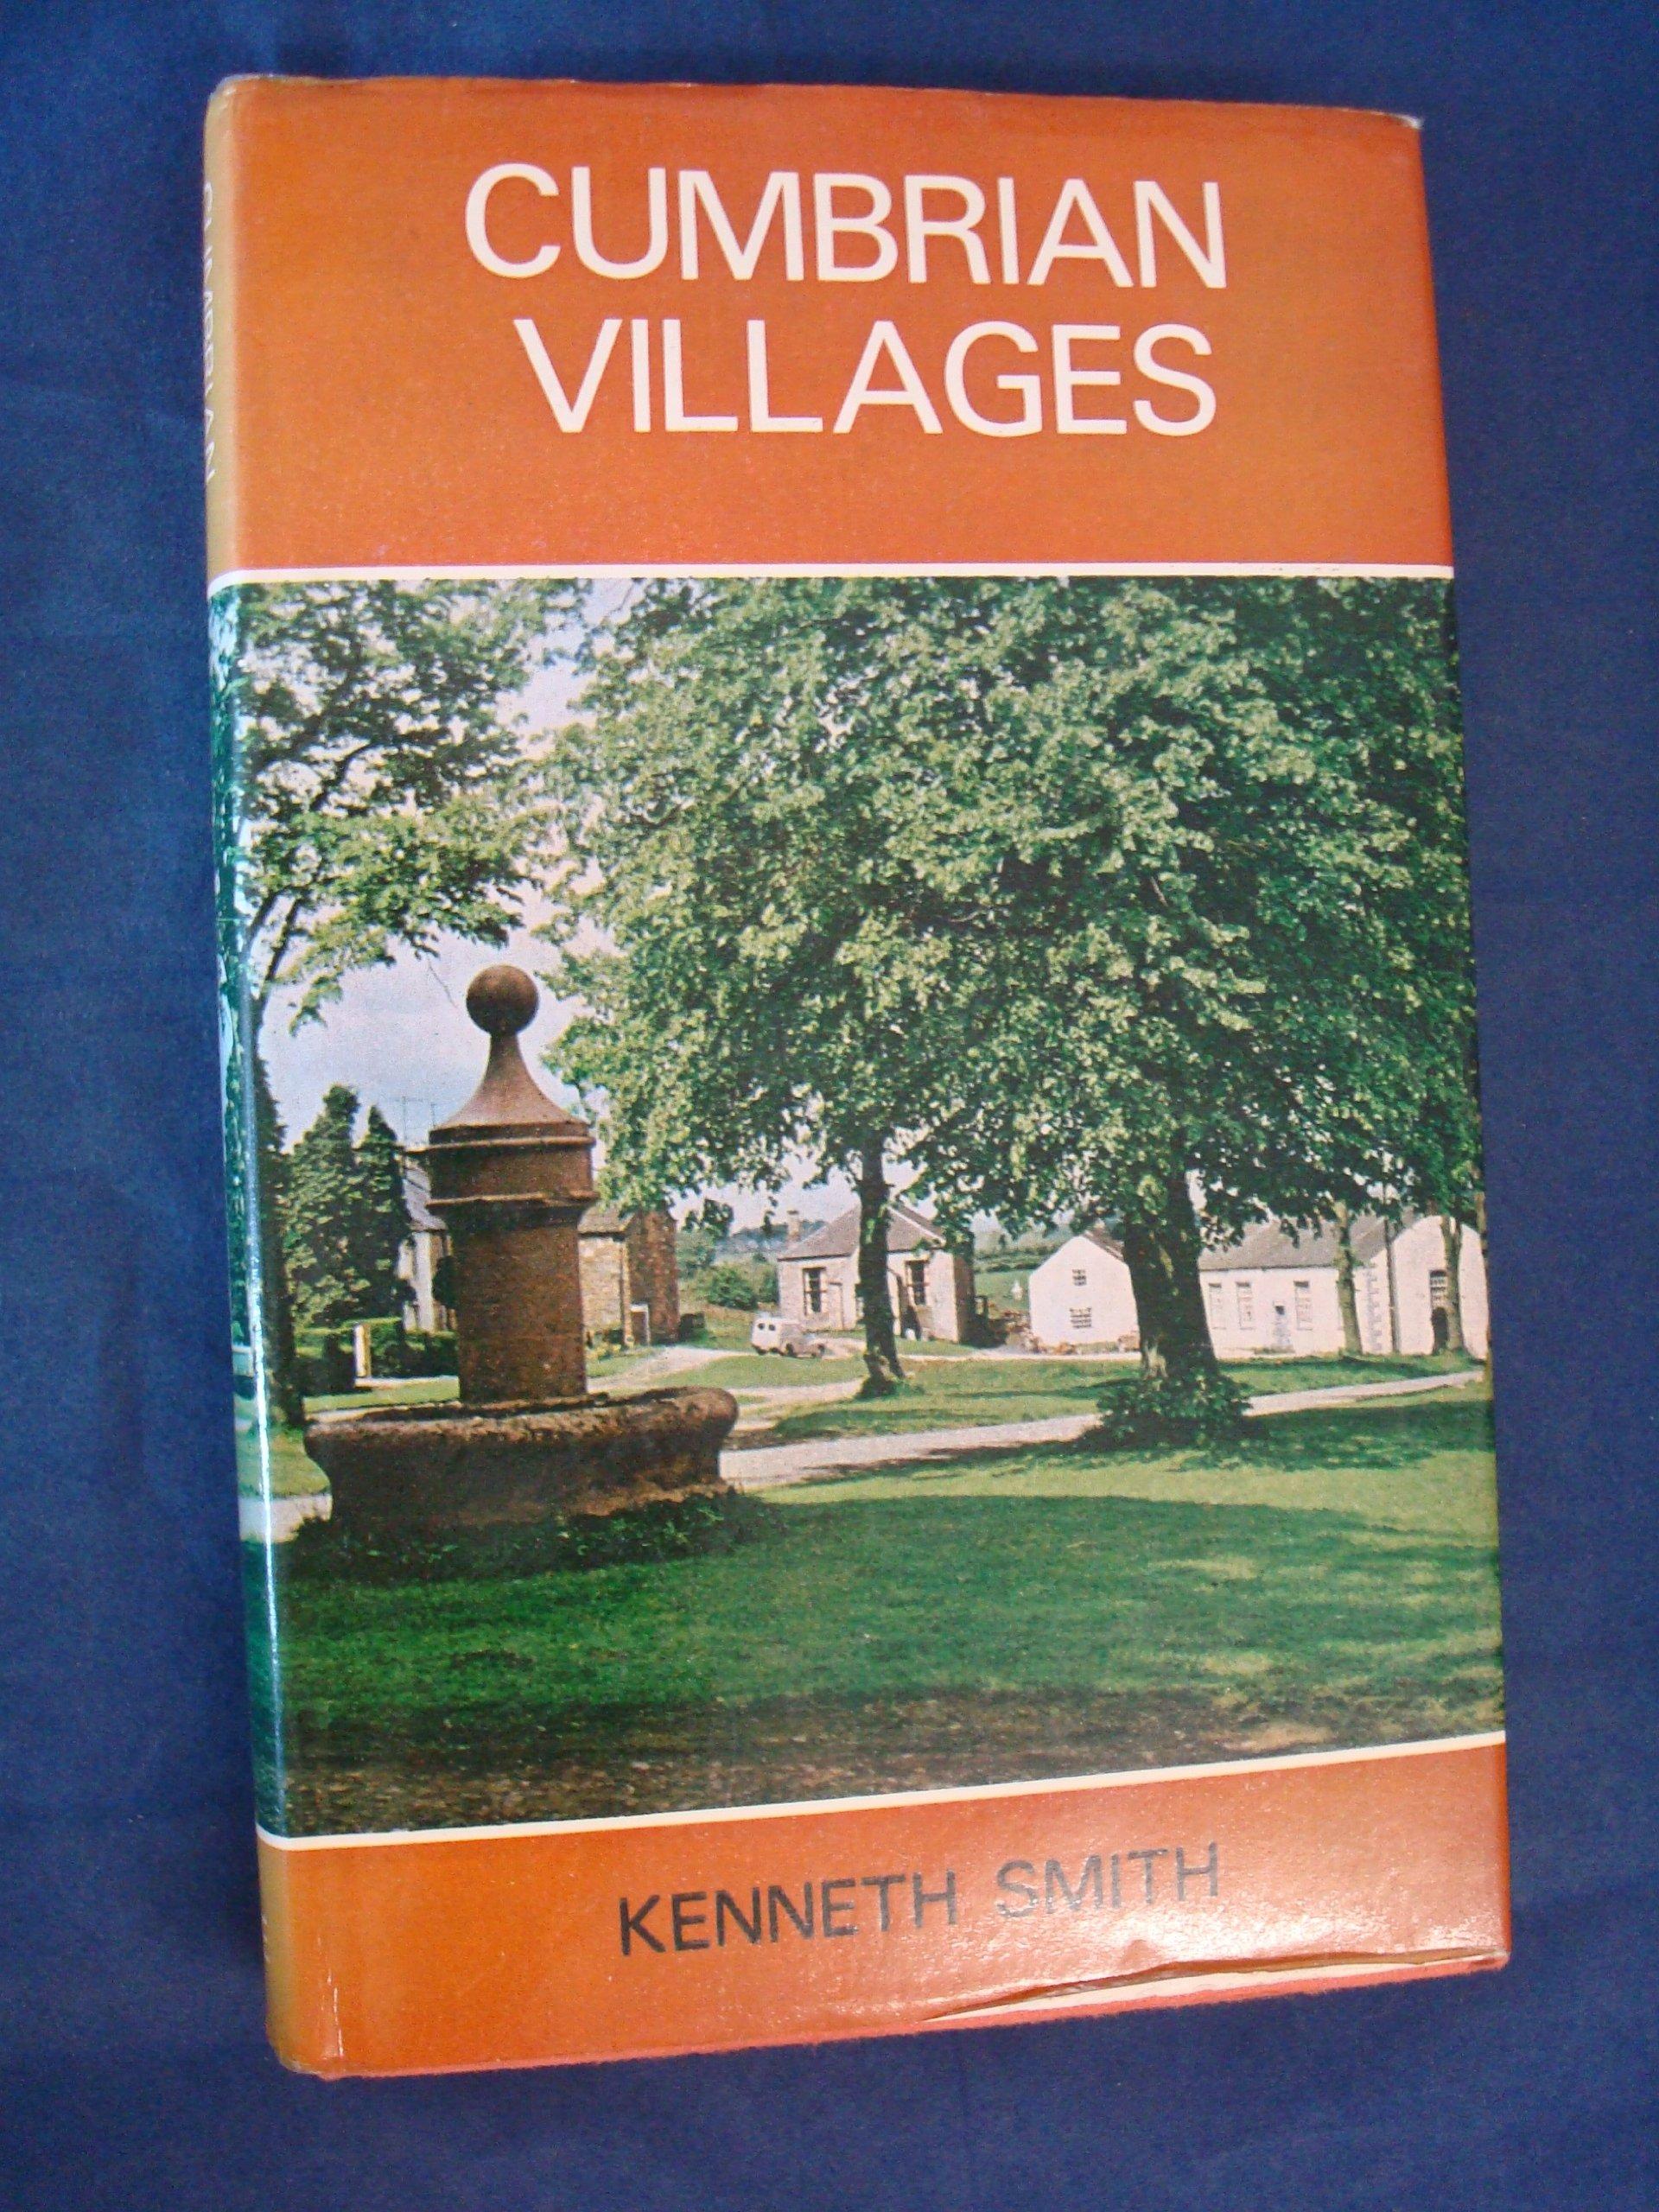 Cumbrian Villages The village series